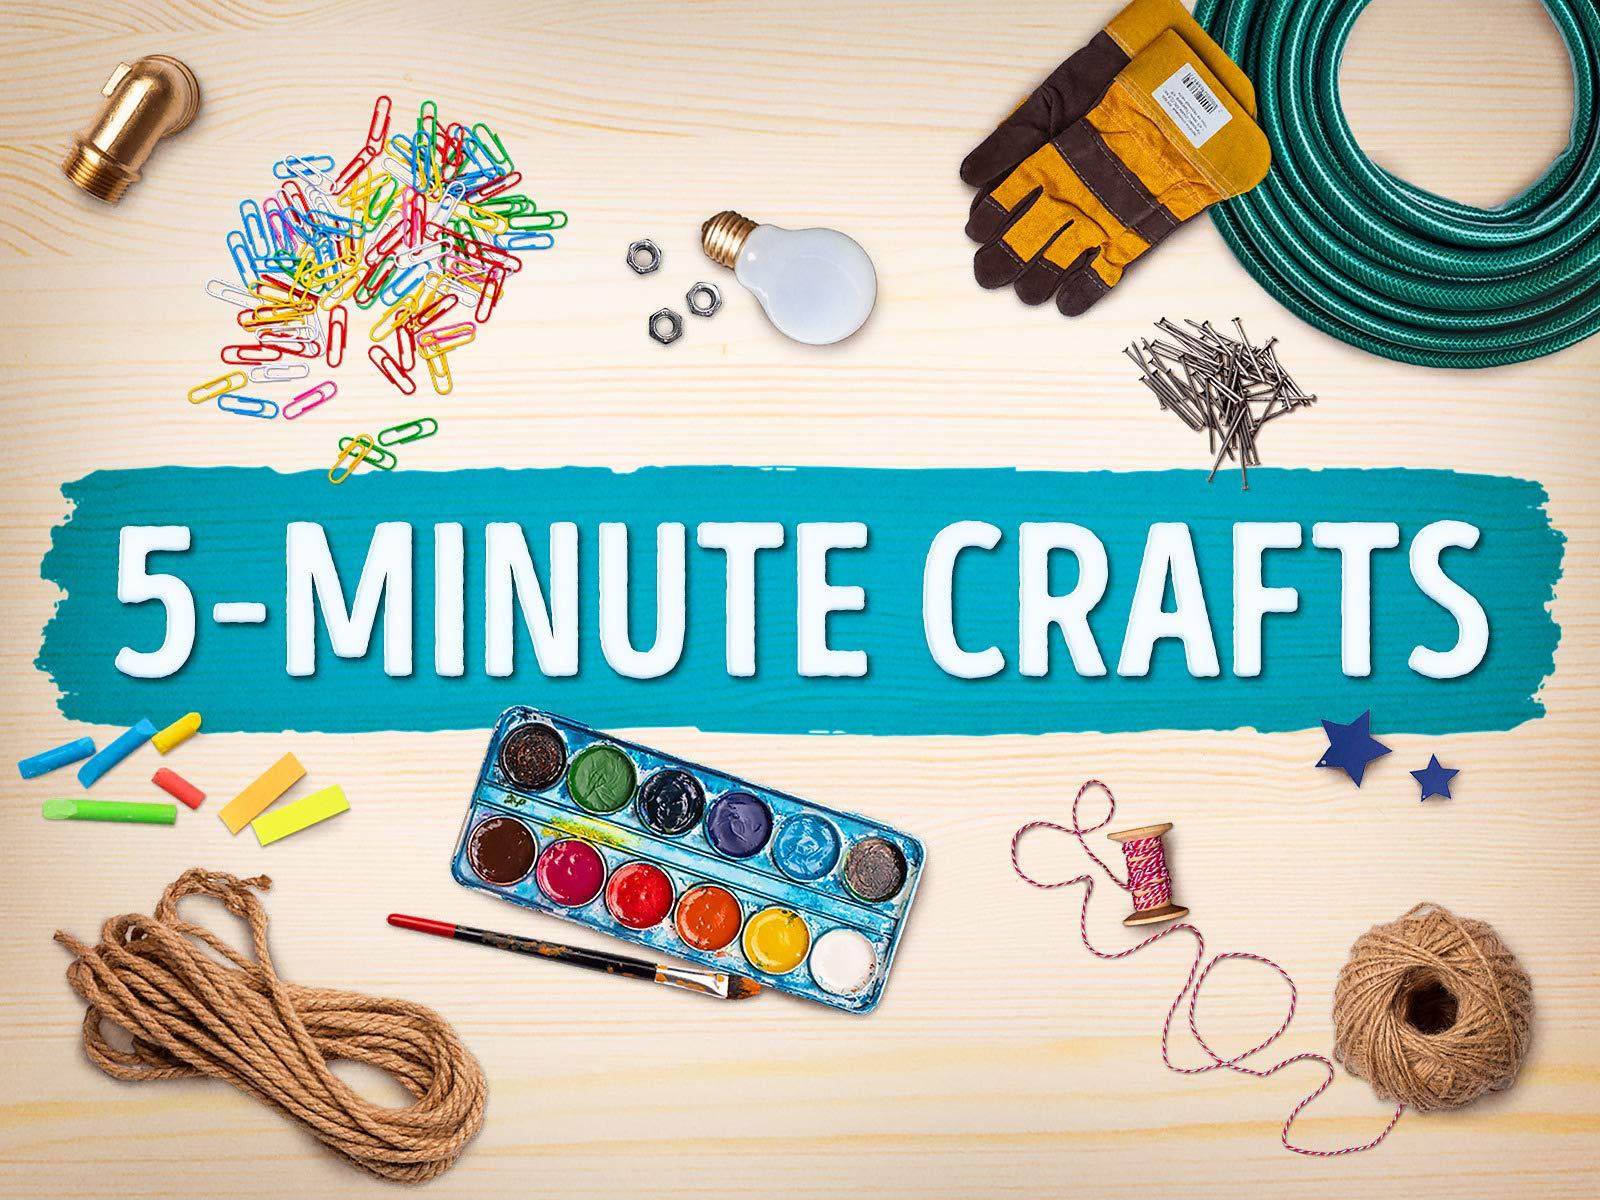 Watch 5 Minute Crafts | Prime Video